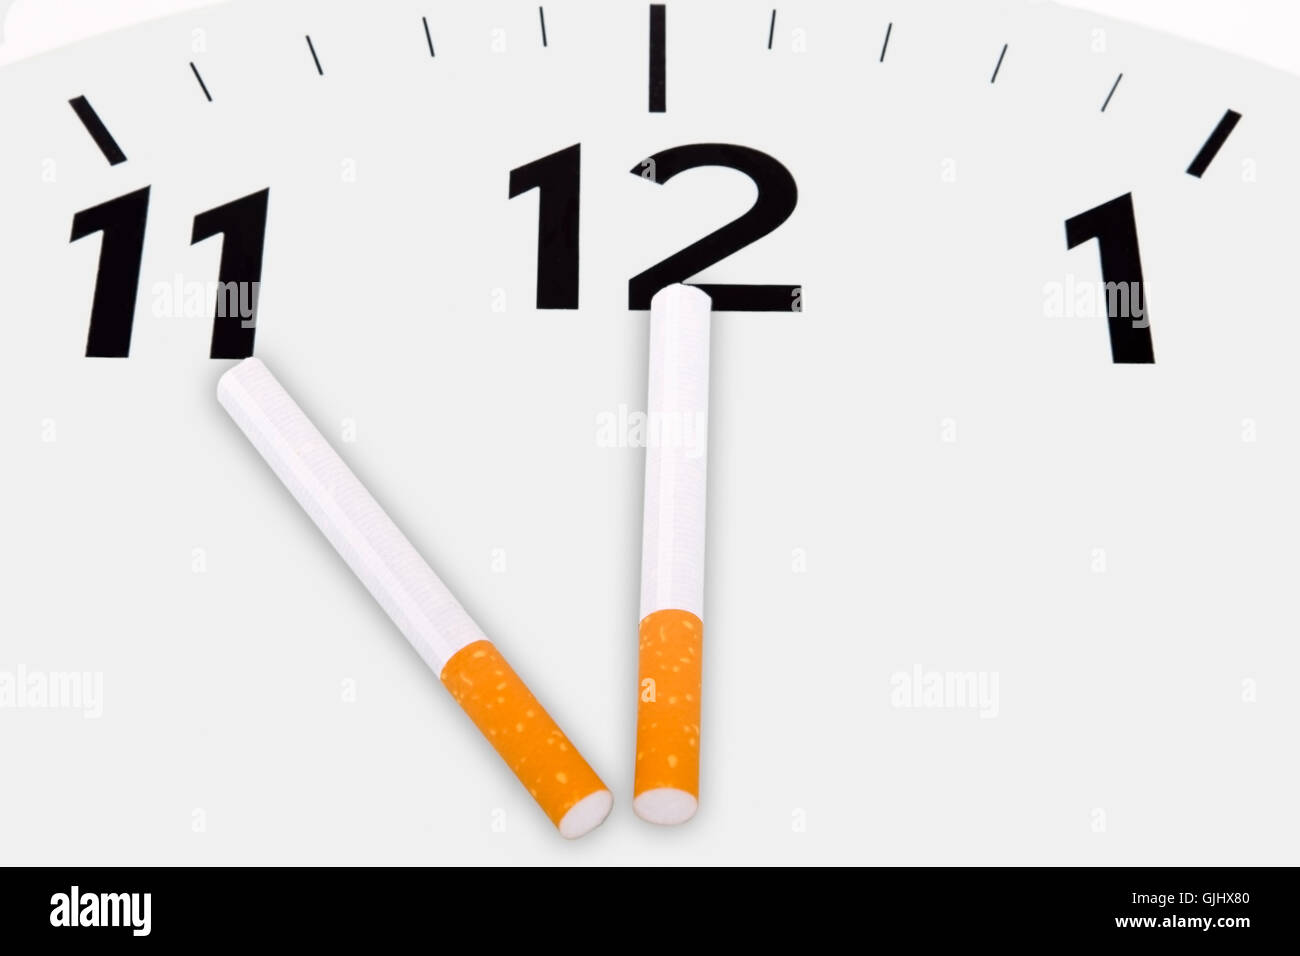 cigarette nonsmoker nicotine - Stock Image